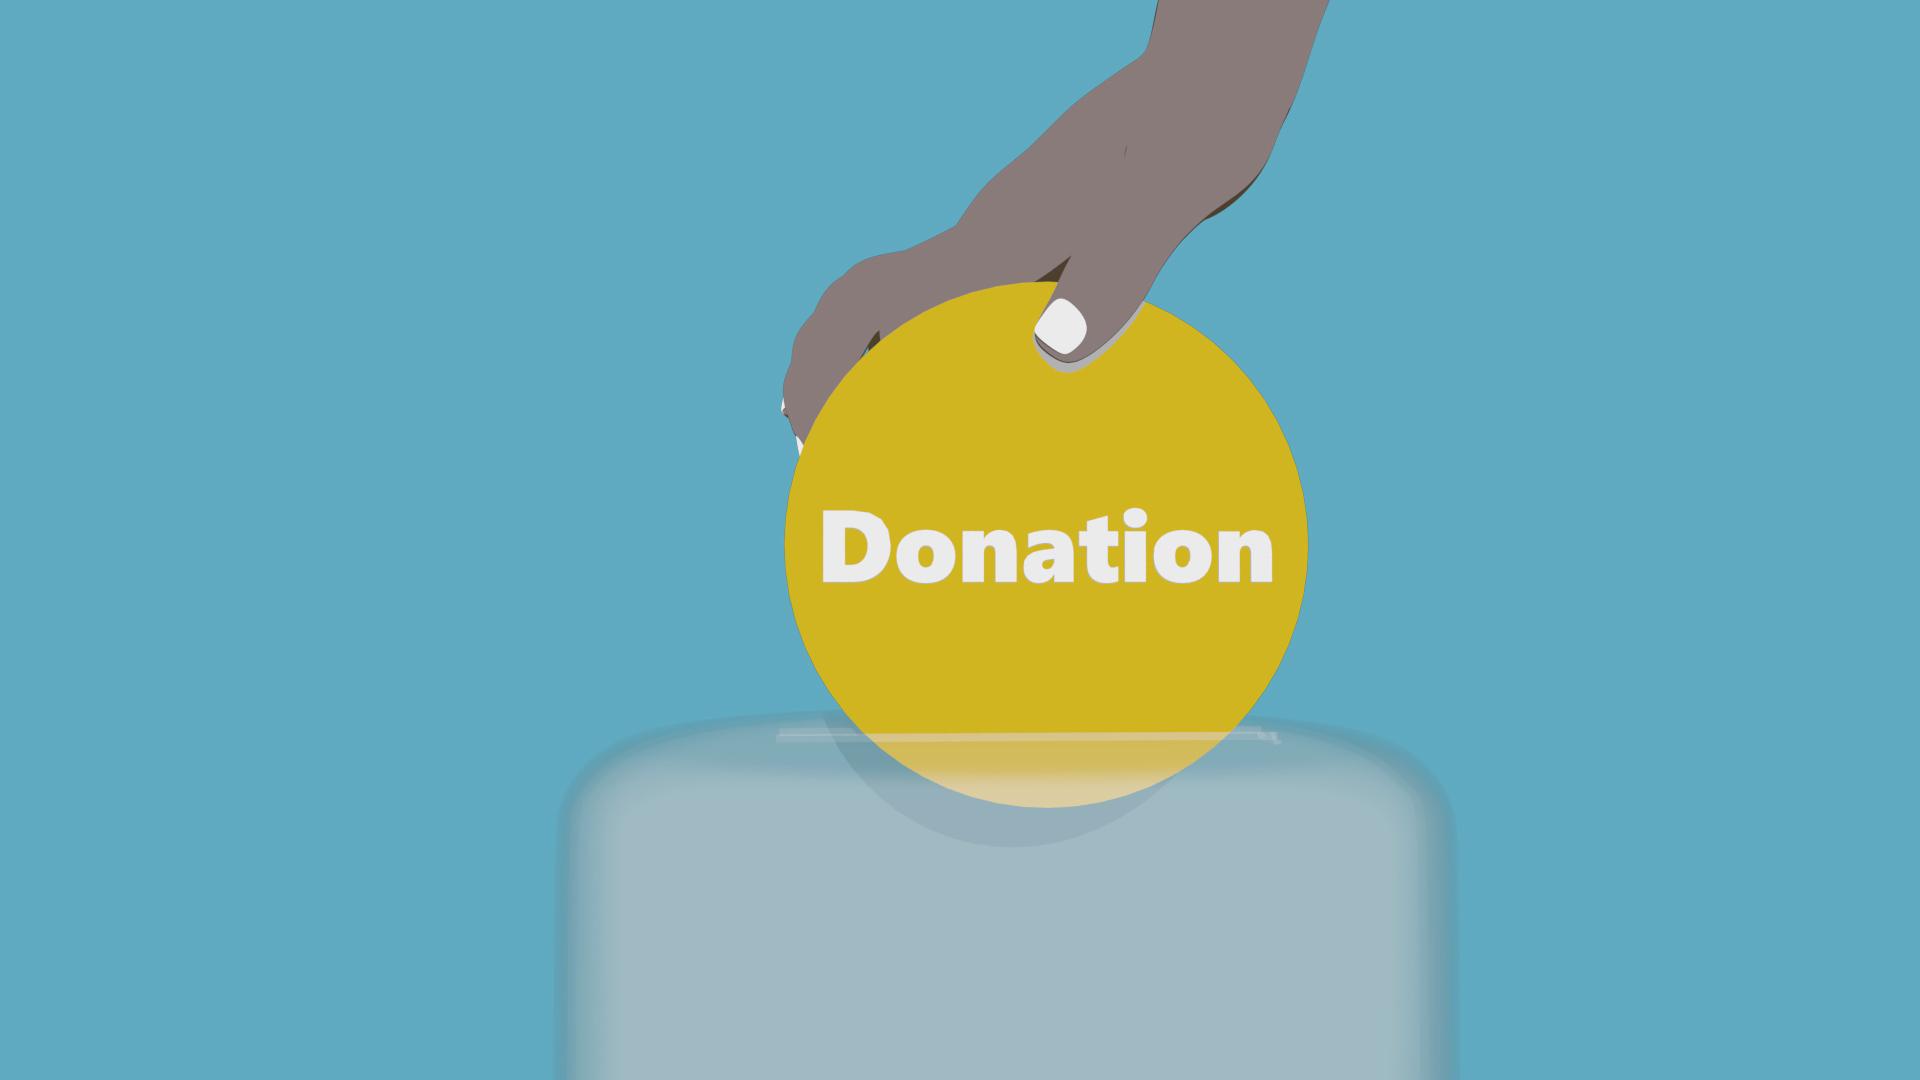 10 percent donation news